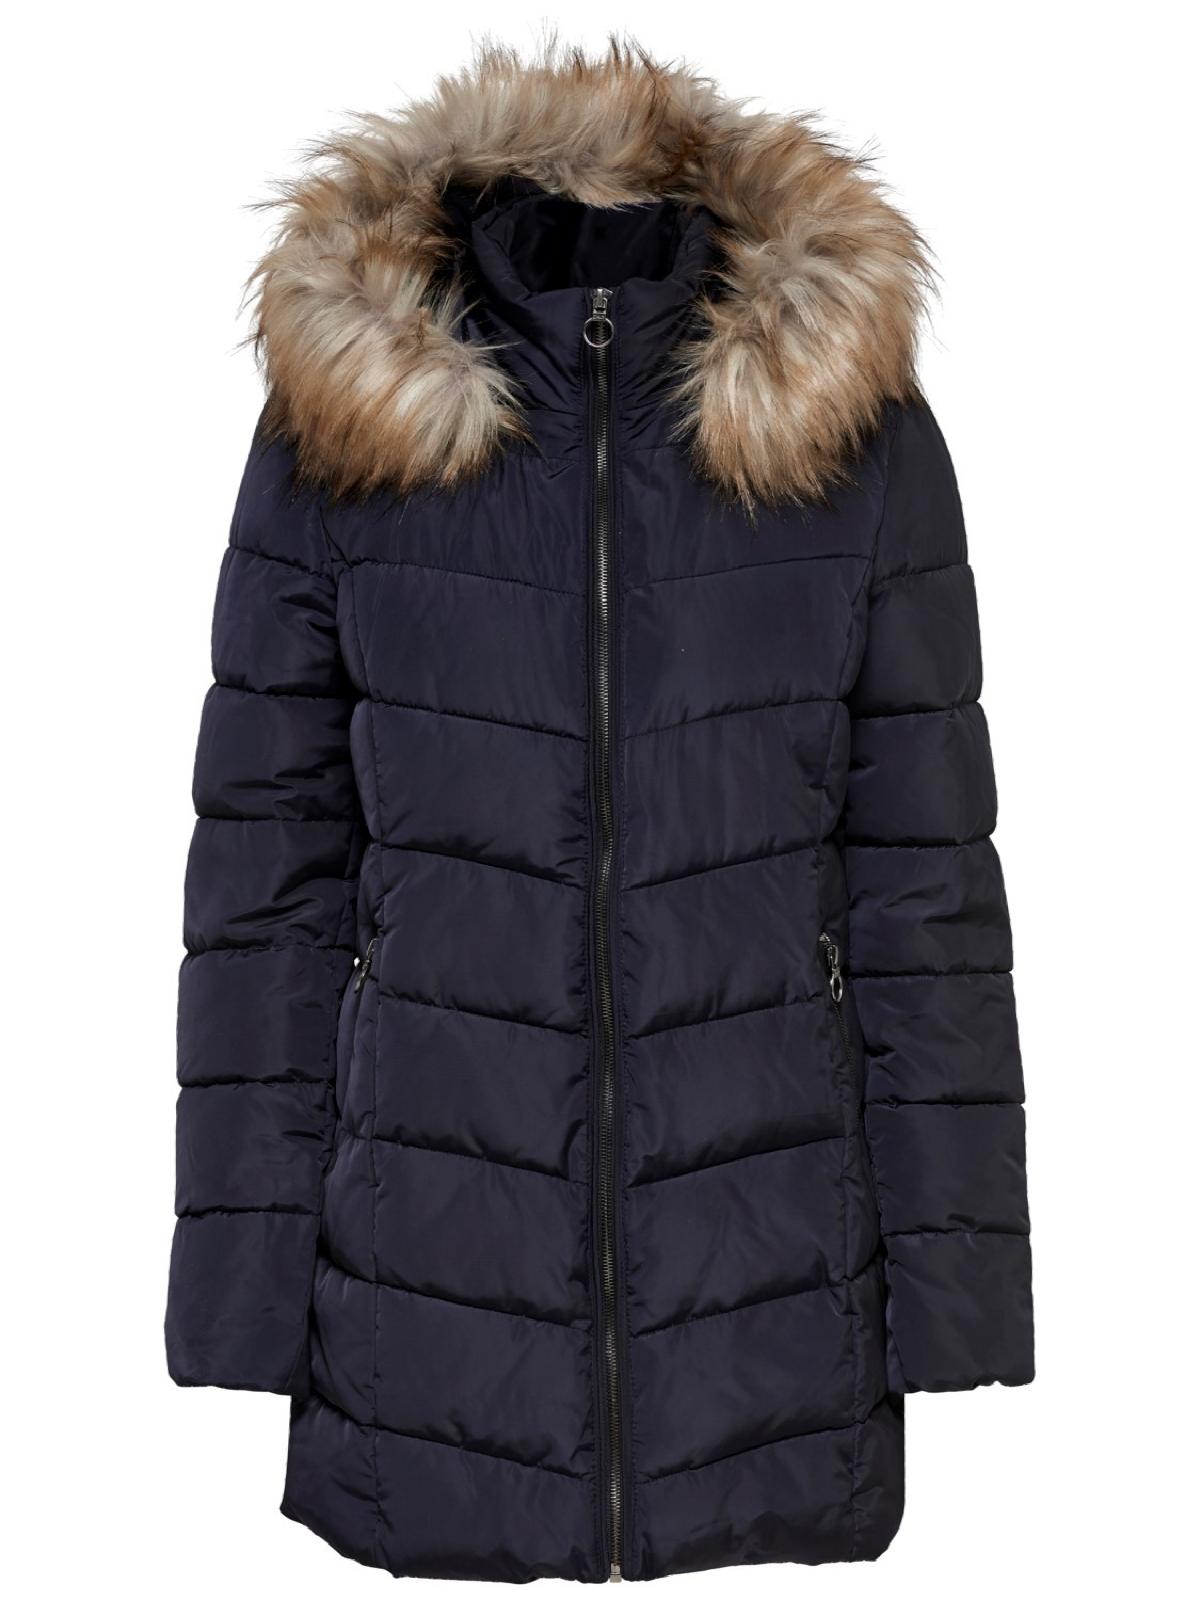 the latest aac2a 35cef Only Damen Winter Jacke Stepp Mantel Parka Fellkapuze blau ...